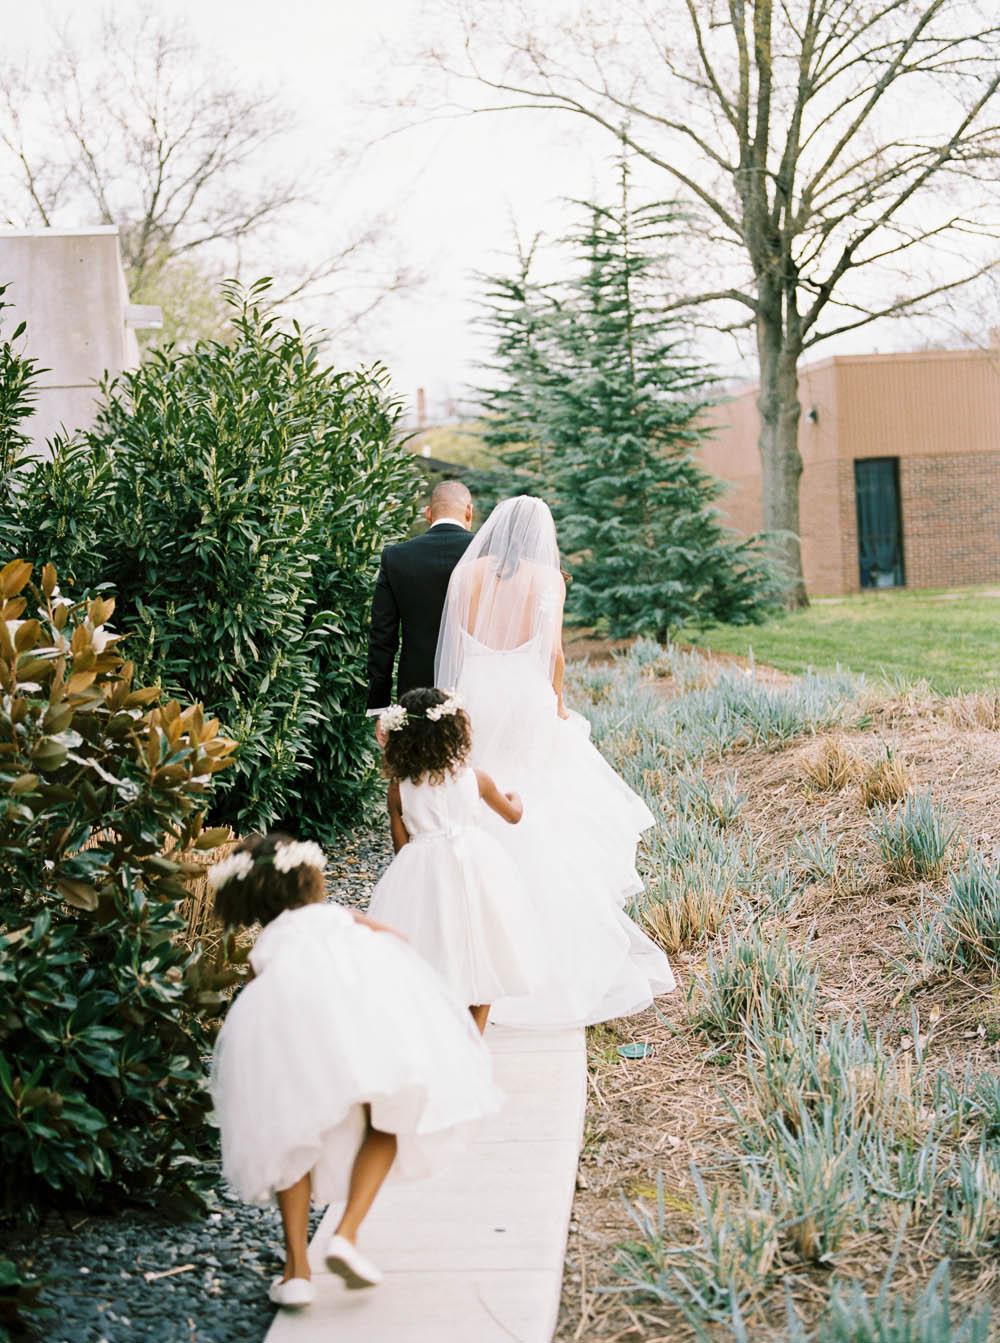 nashville ruby film documentary wedding photographer heartfelt real moments african american wedding munalachi bride ©2016abigailbobophotography-29.jpg